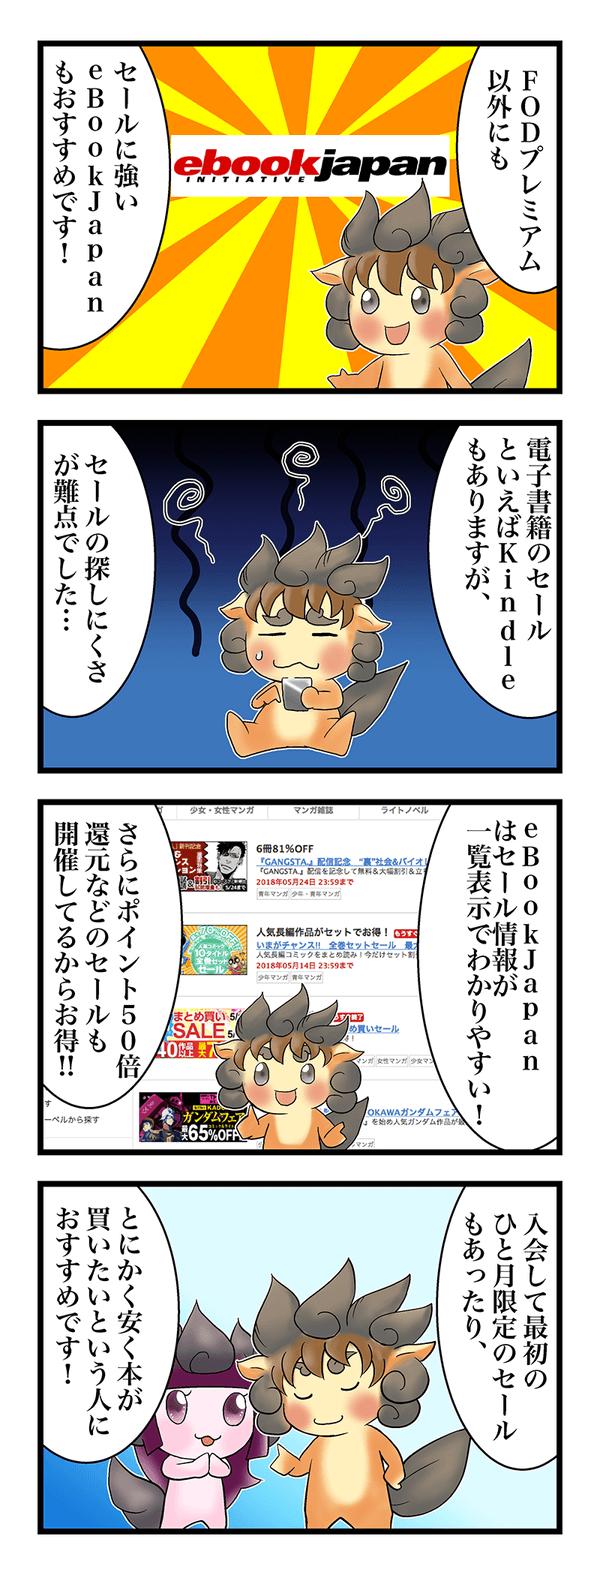 ebookjapan漫画